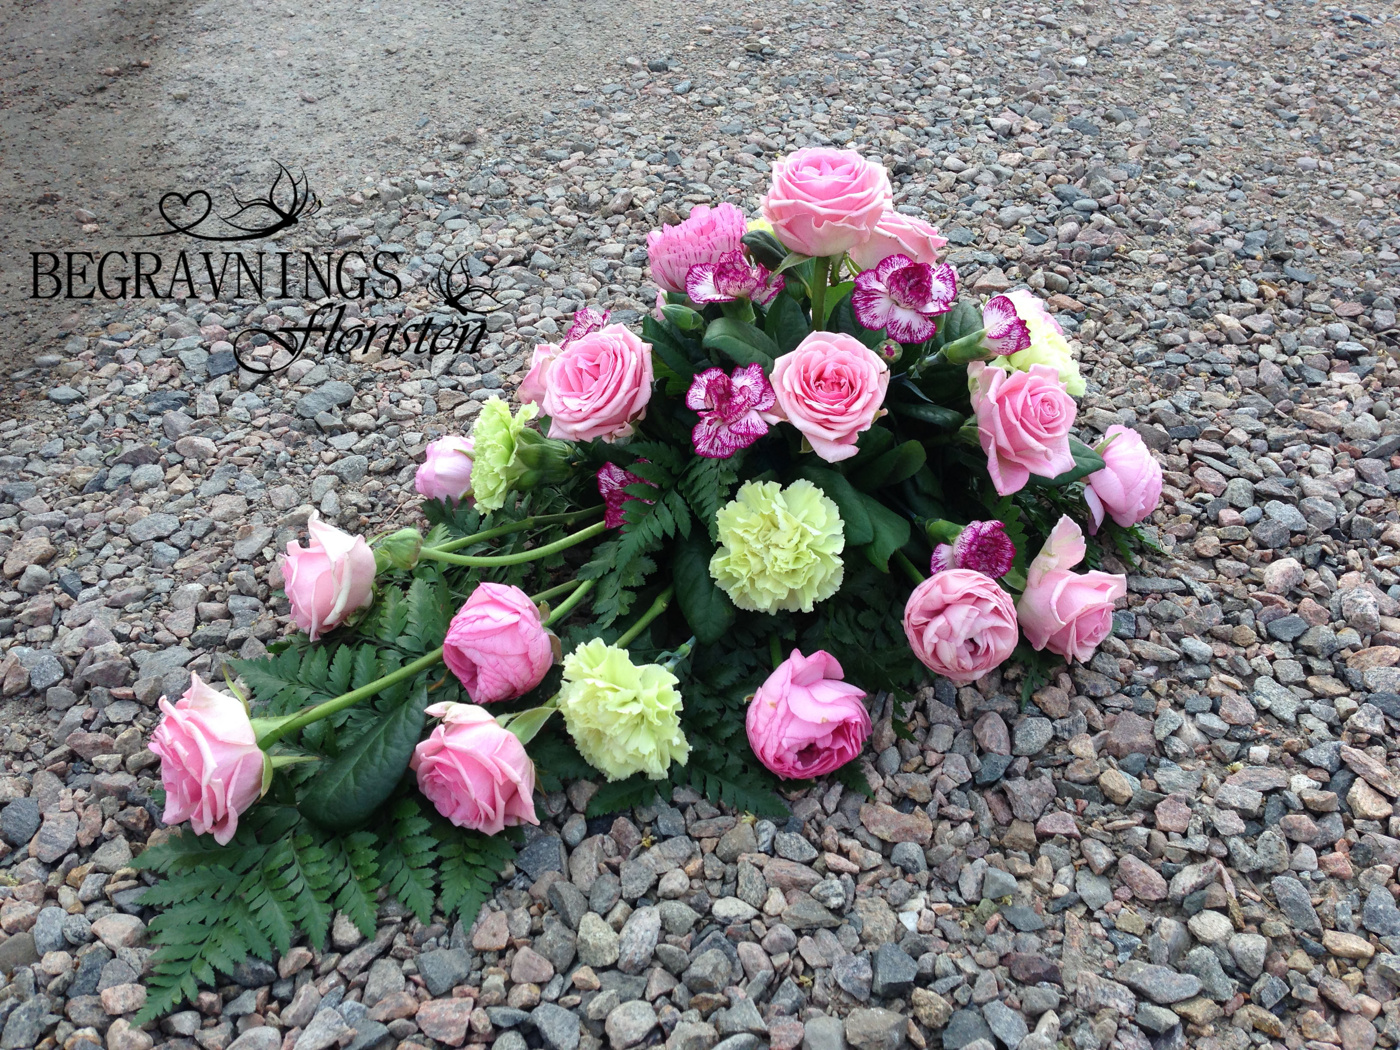 blommor-begravning-rosor-nejlikor